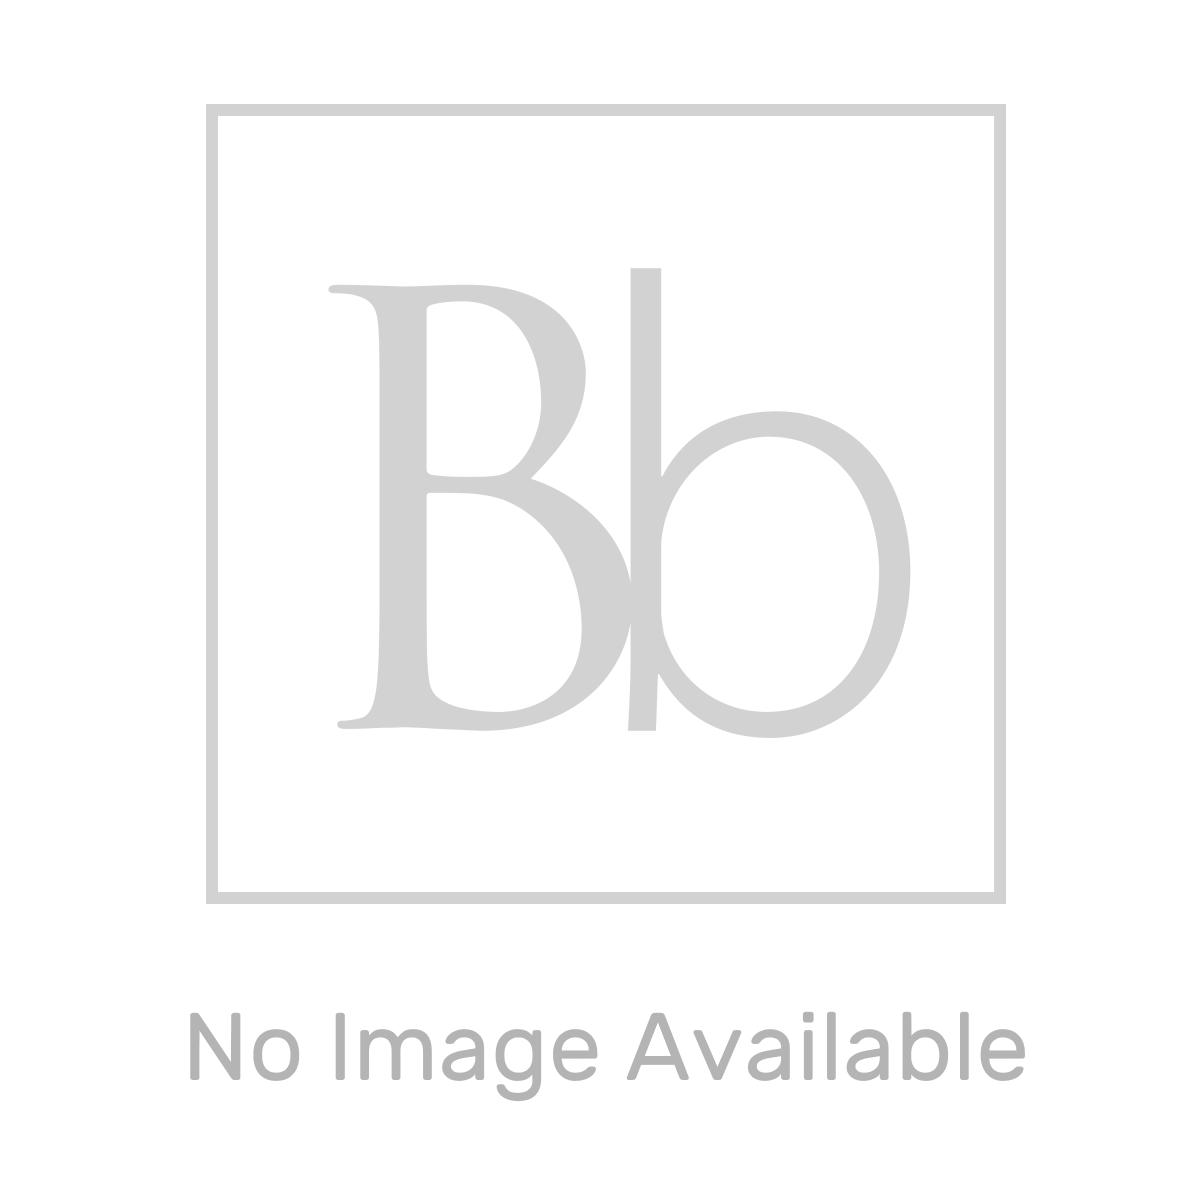 Nuie Athena Natural Oak 2 Door Floor Standing Vanity Unit with 40mm Profile Basin 600mm Line Drawing